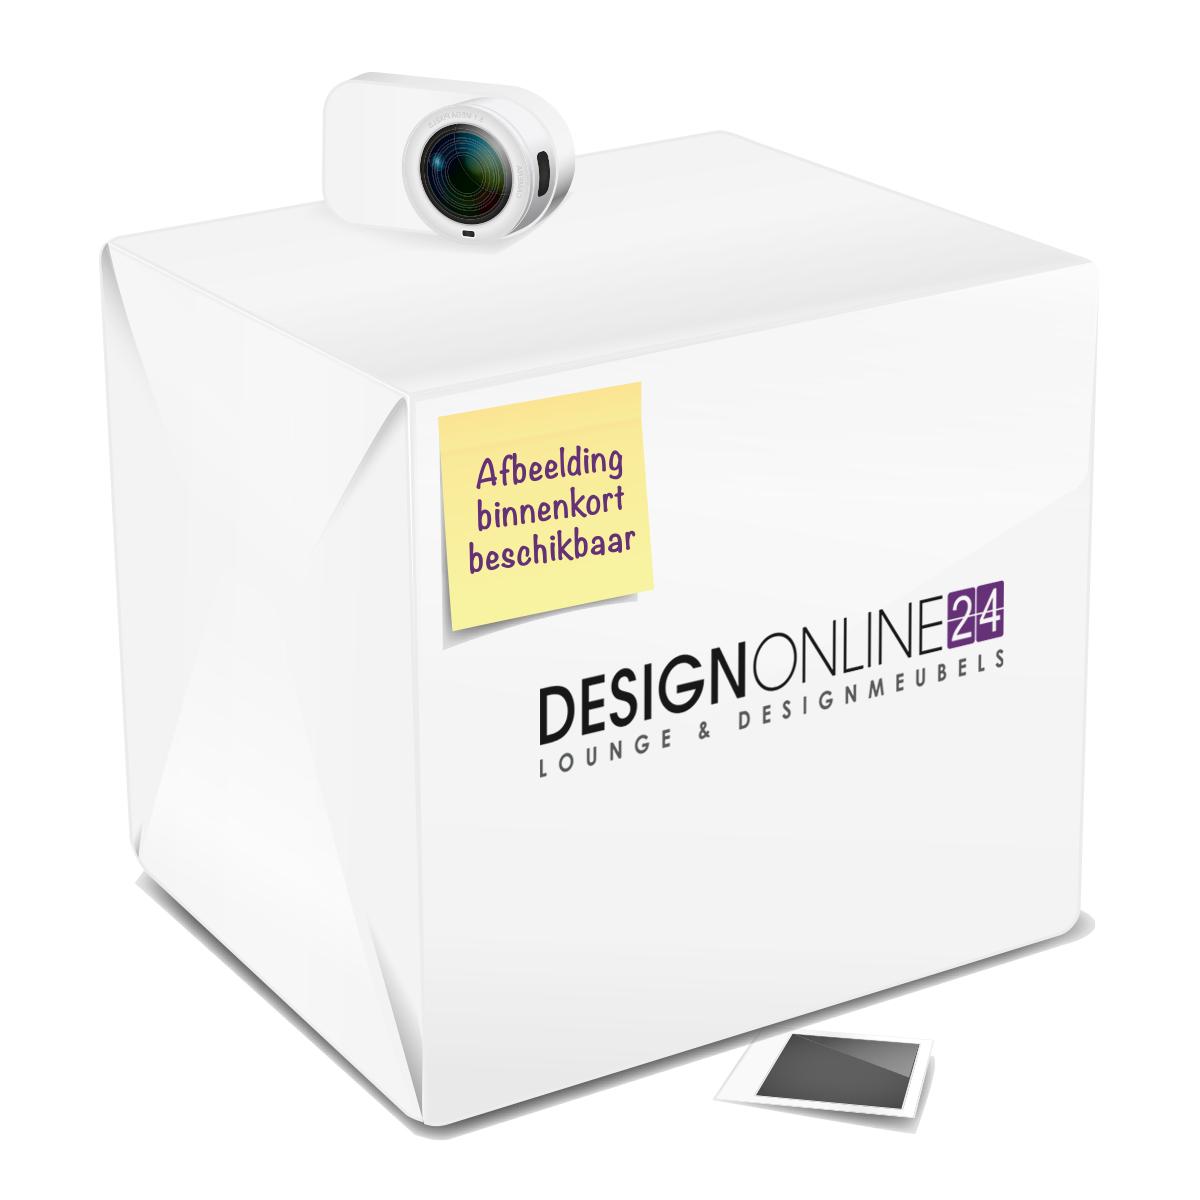 Moderne Witte Eetkamerstoel  Koop Online  DesignOnline24